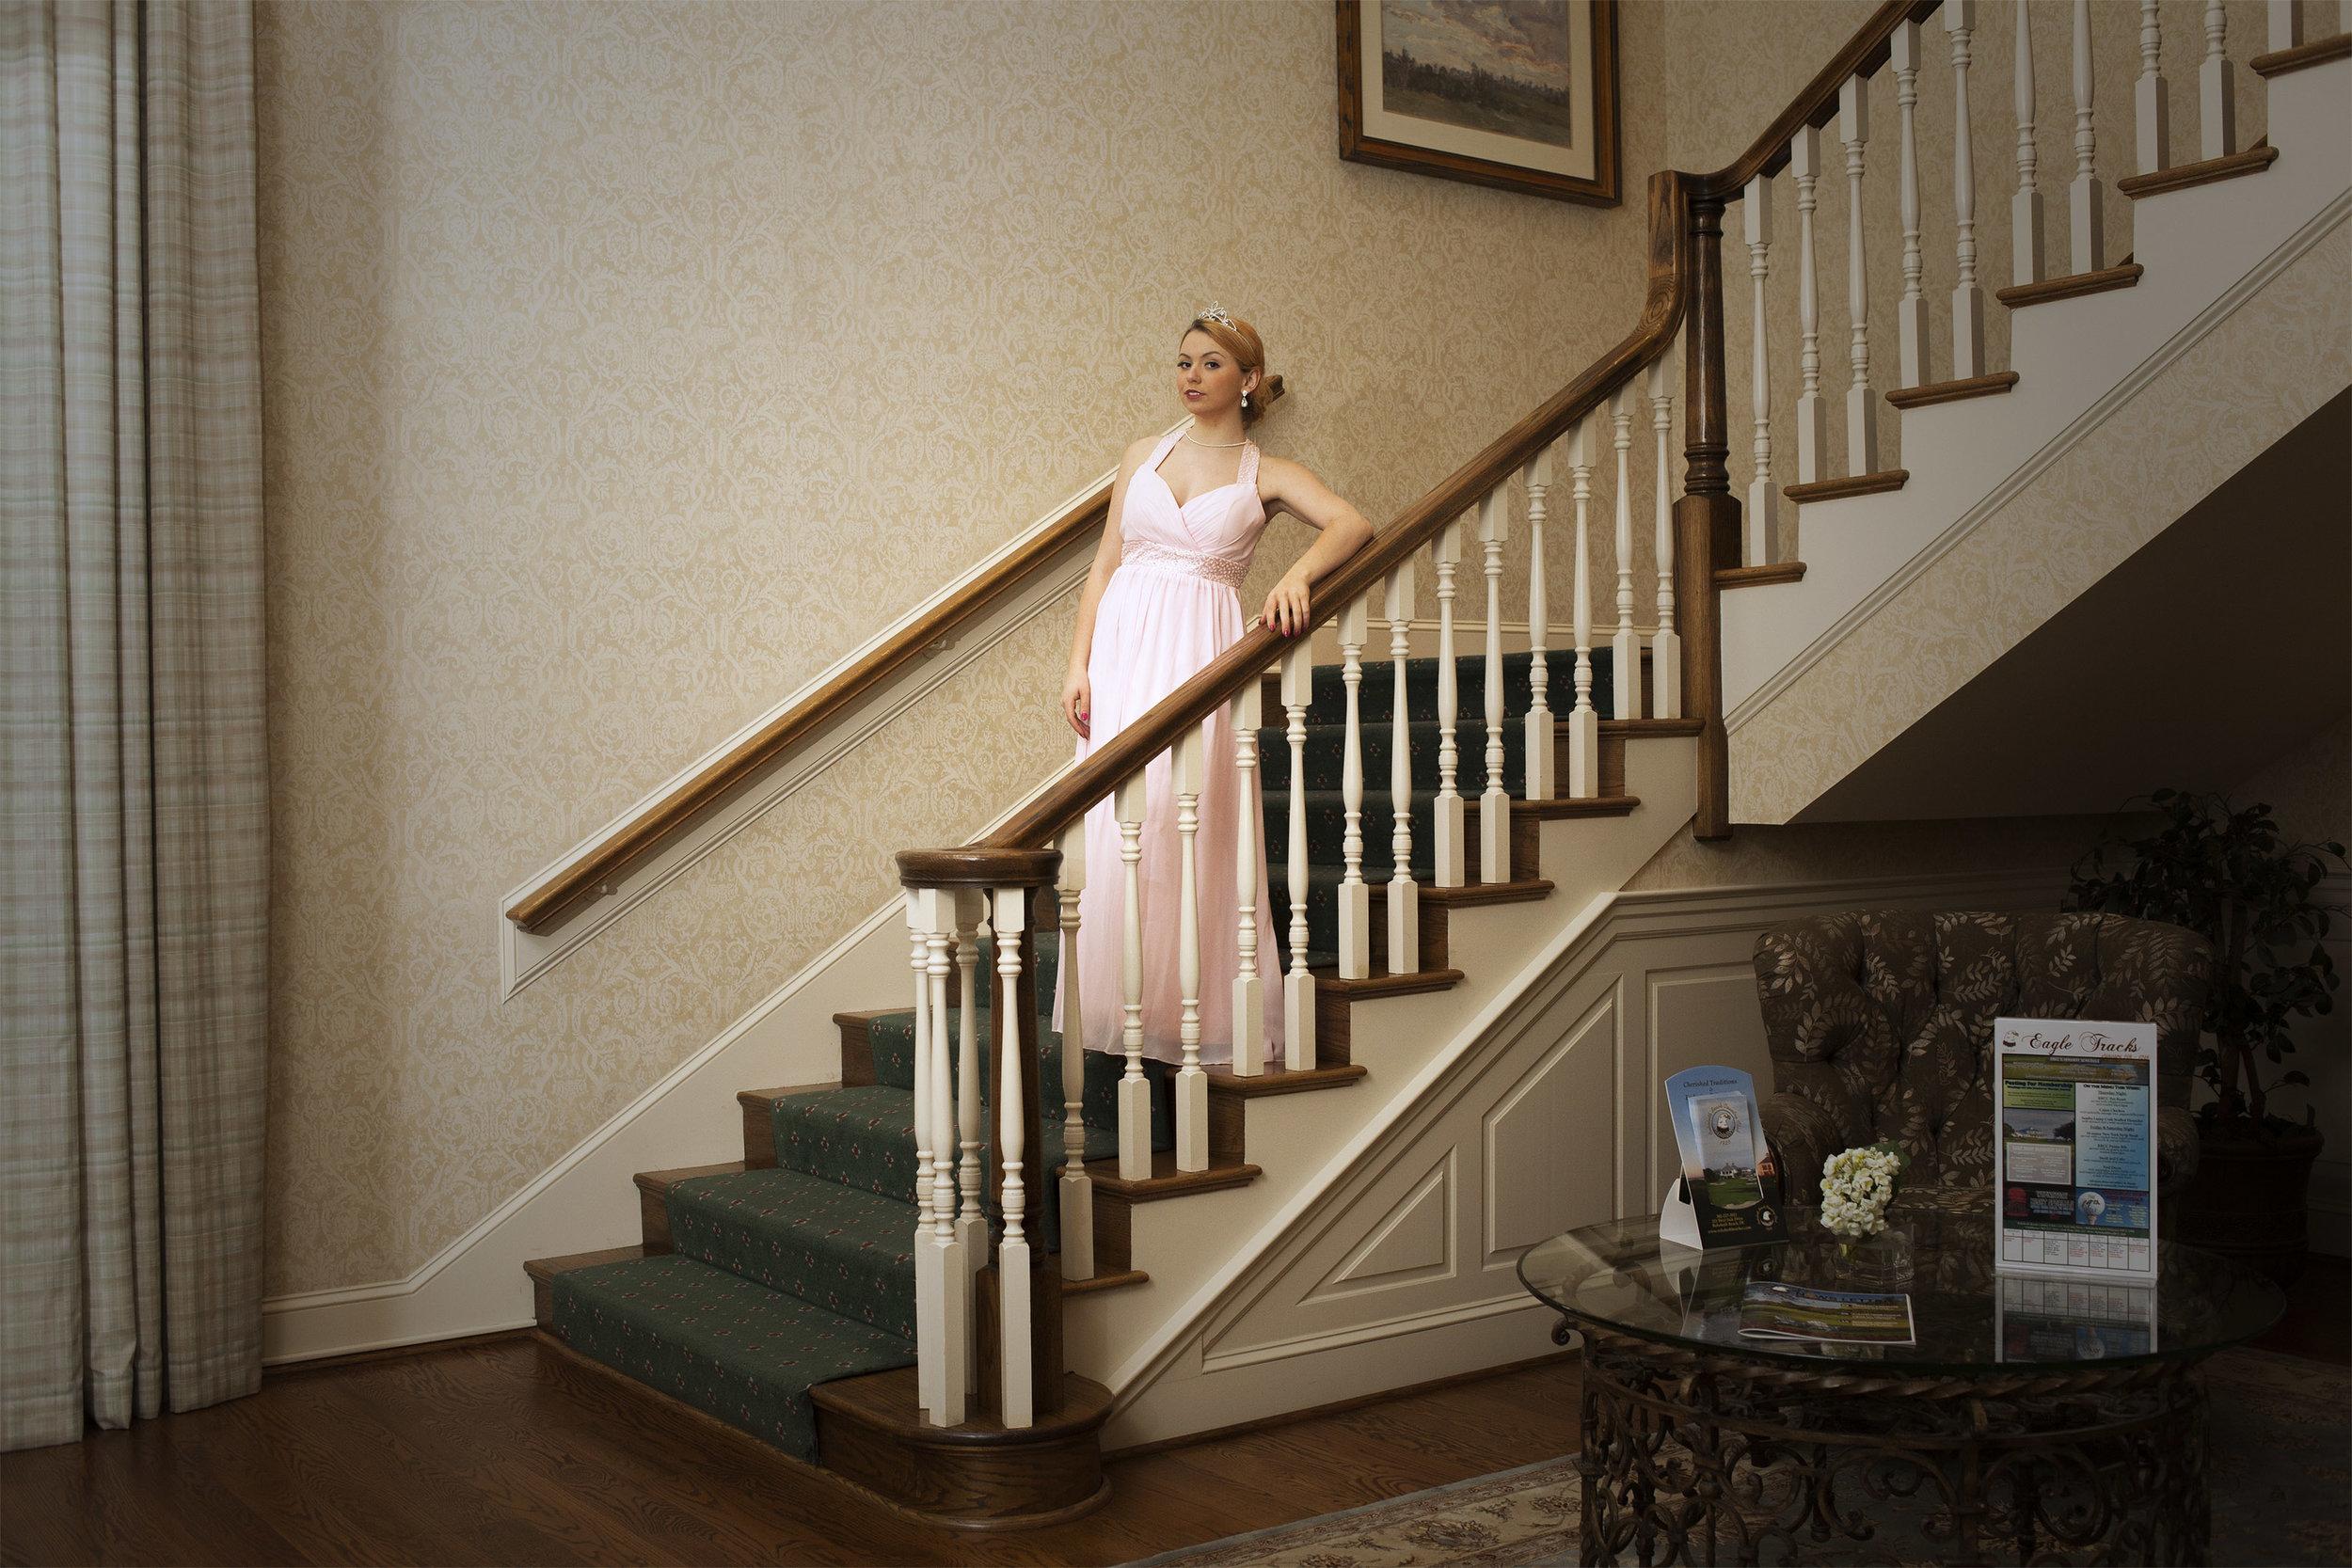 prom_countryclub_stairs copy.jpg